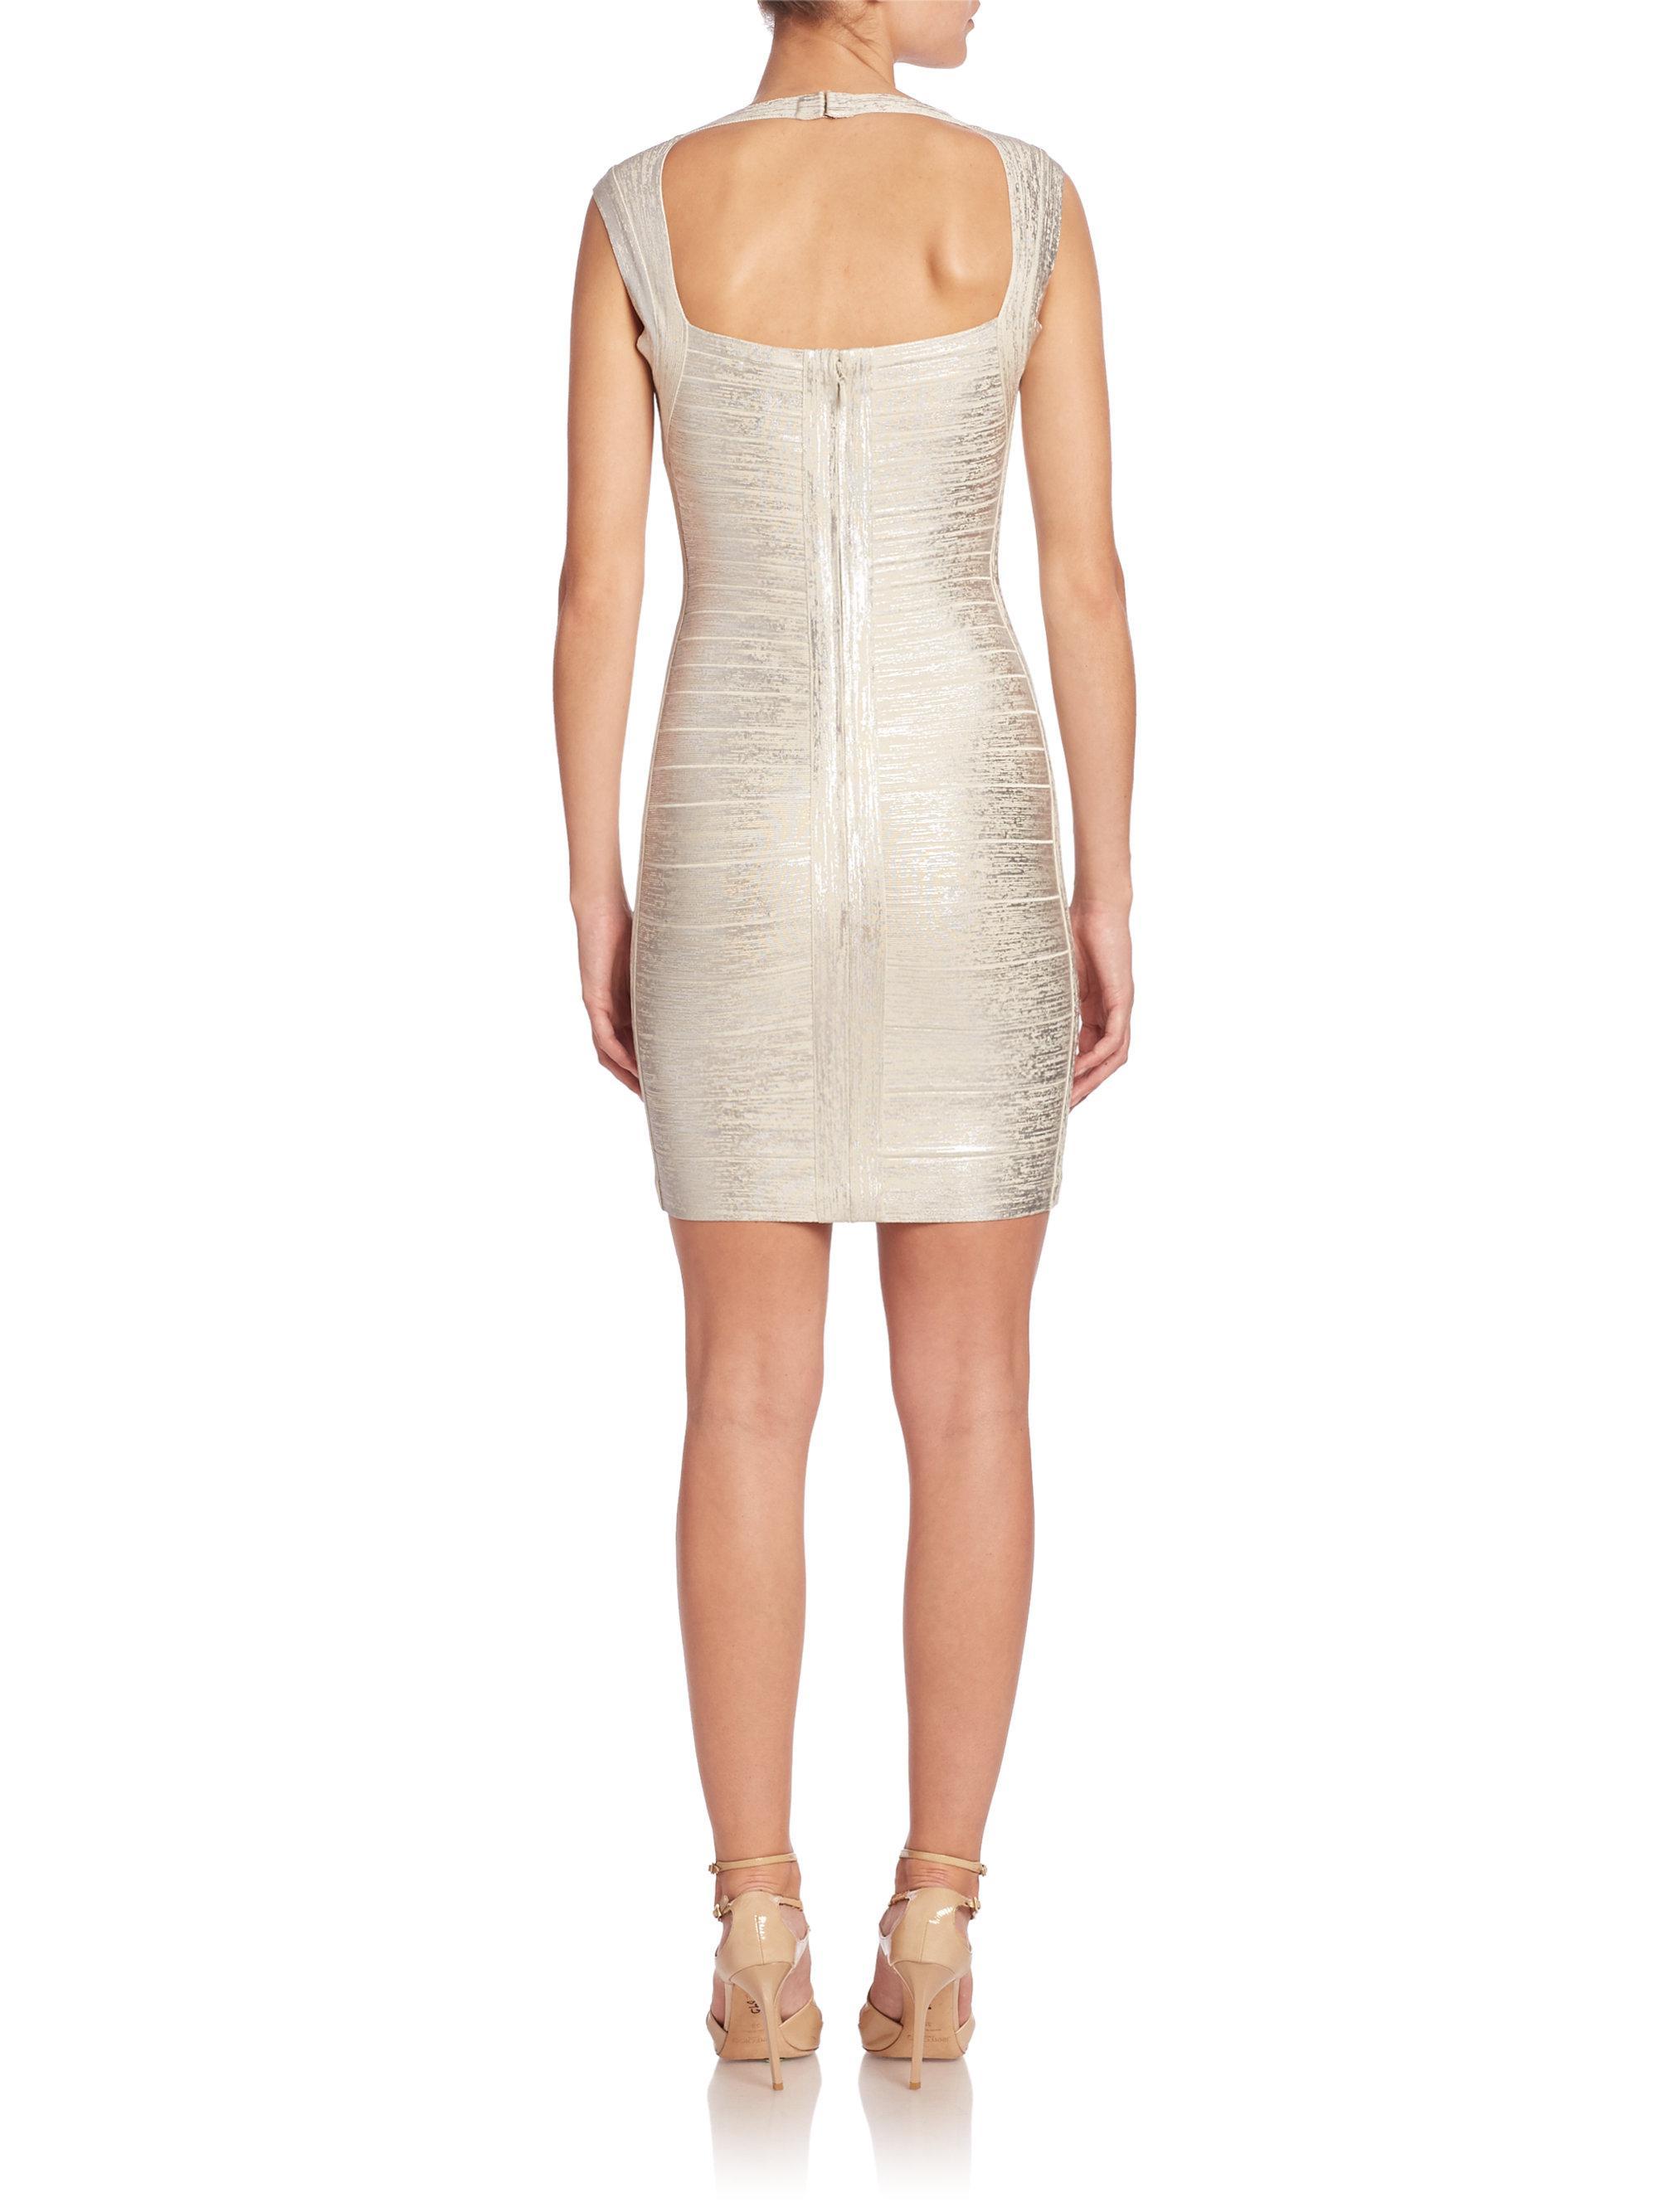 Fringed Metallic Bandage Gown - Silver H QDQ58